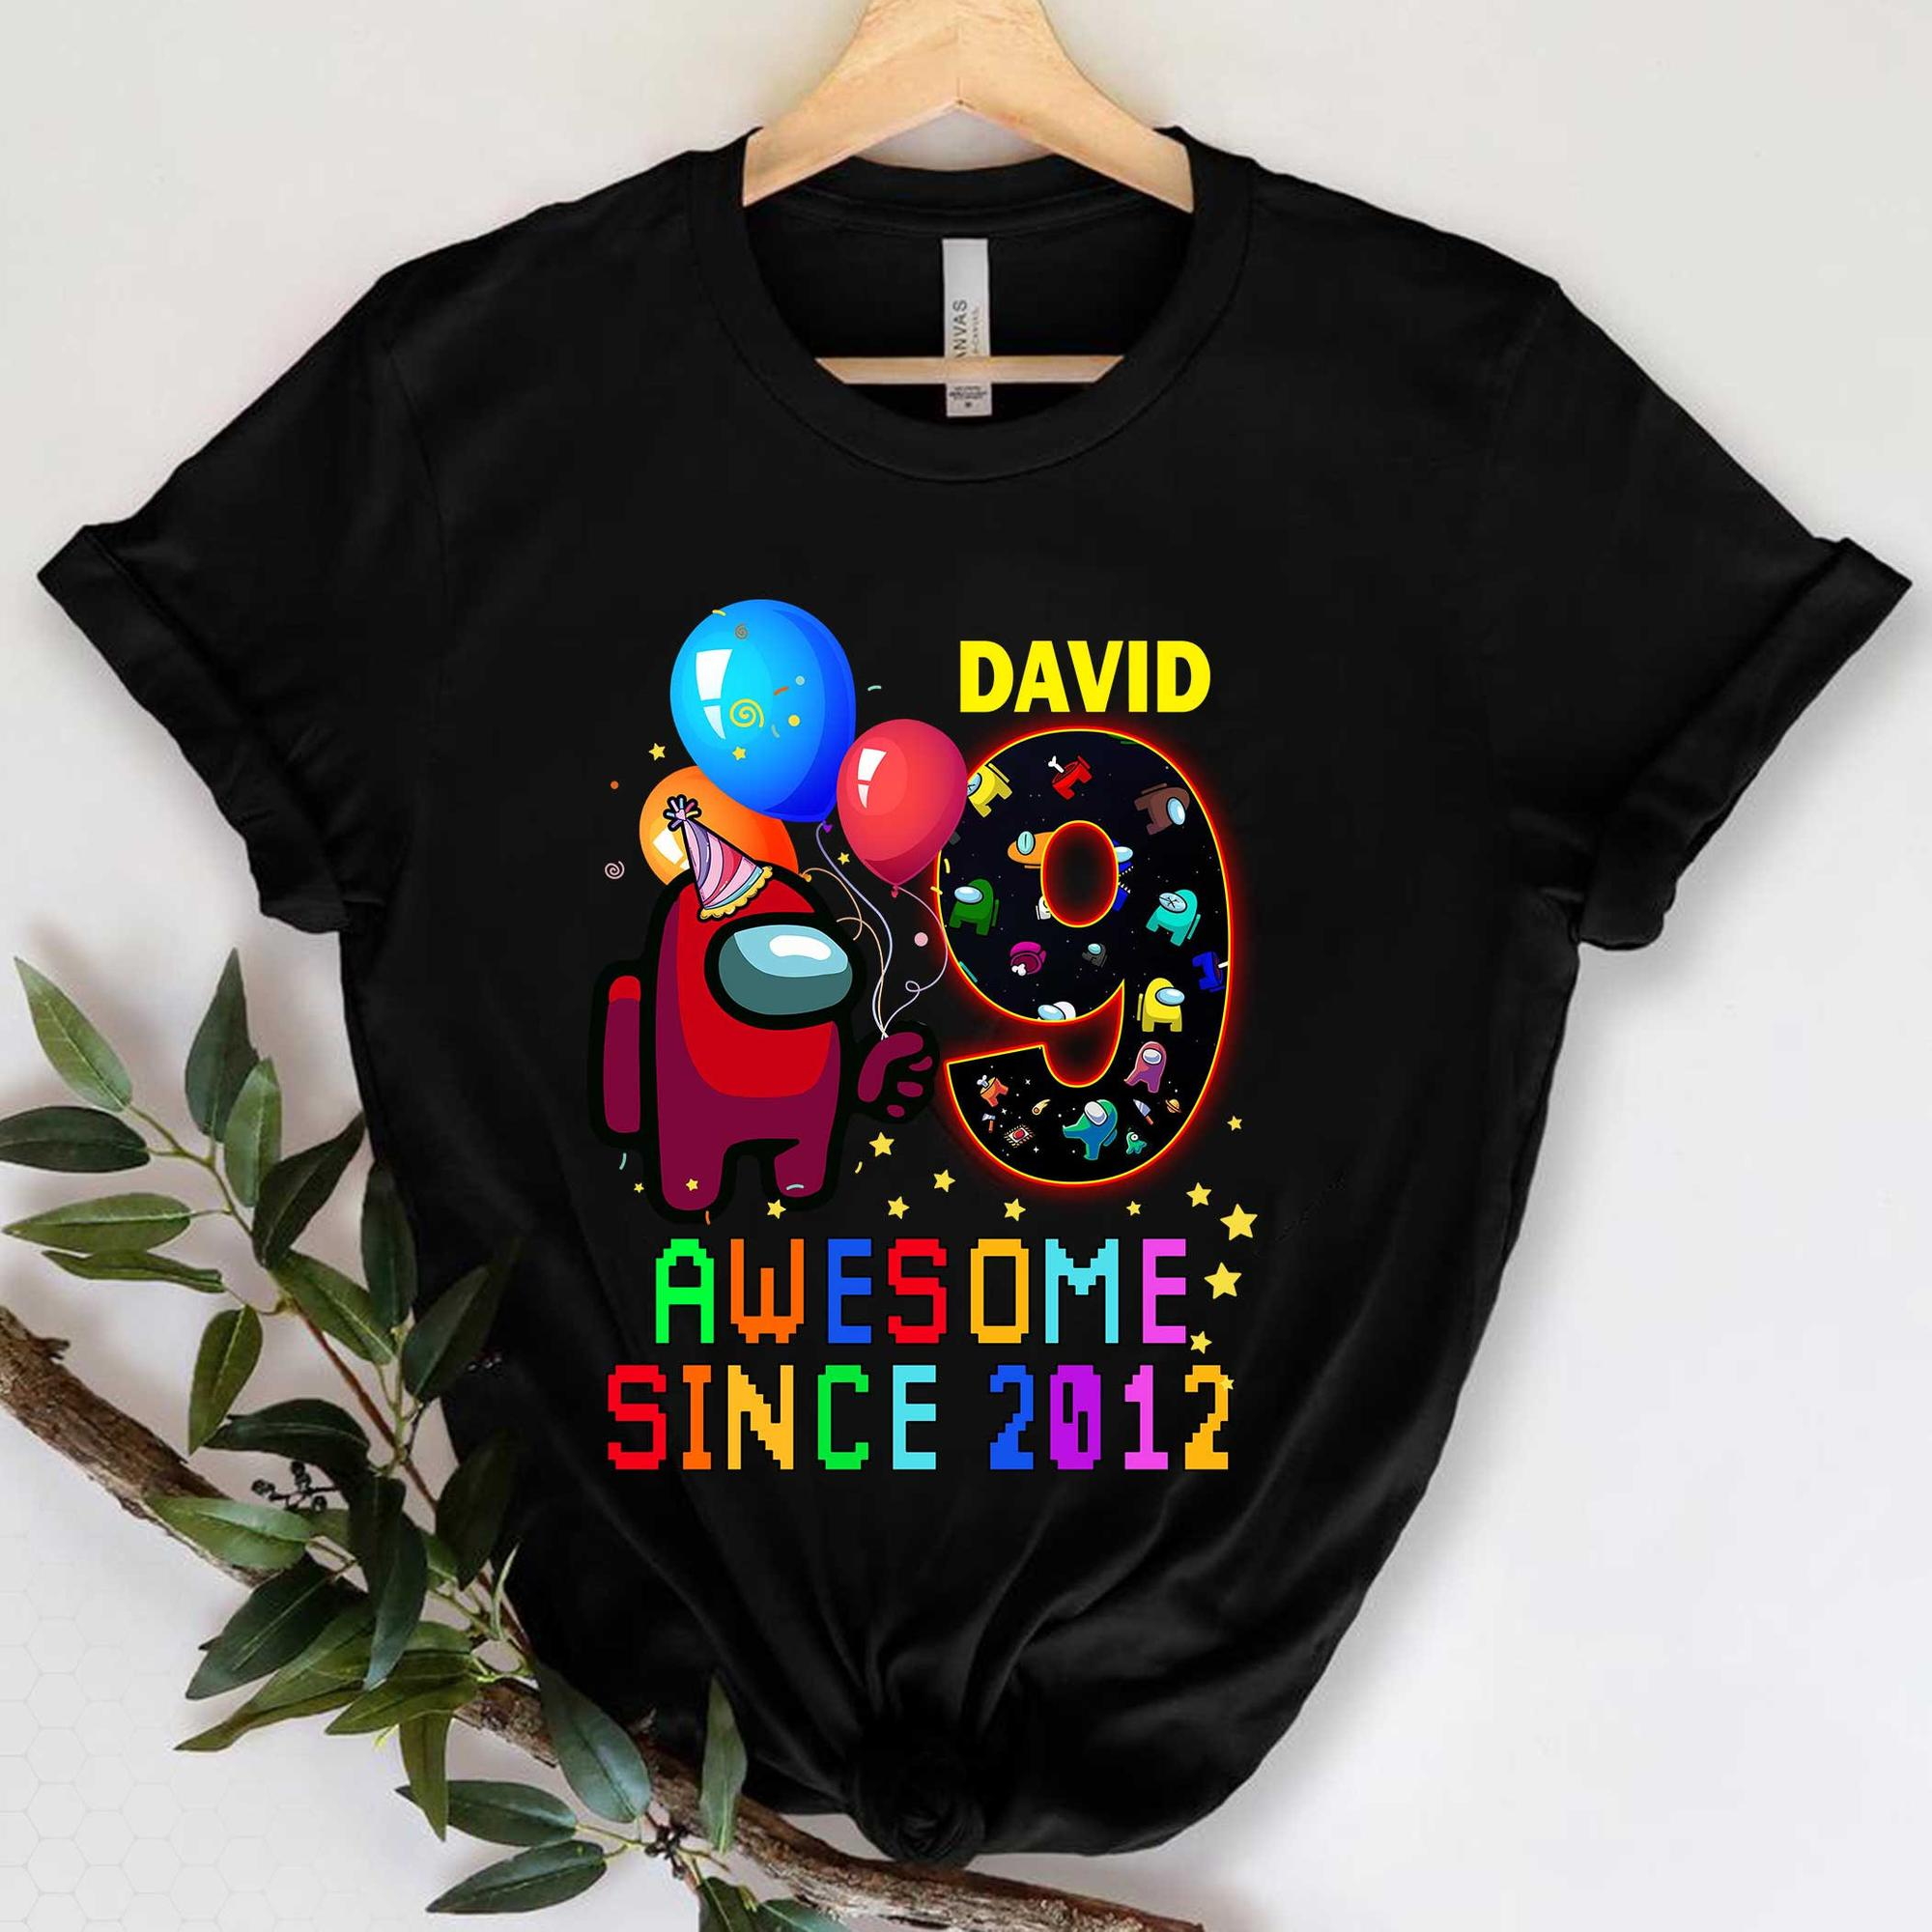 Personalized Among Us Birthday Gift Shirt